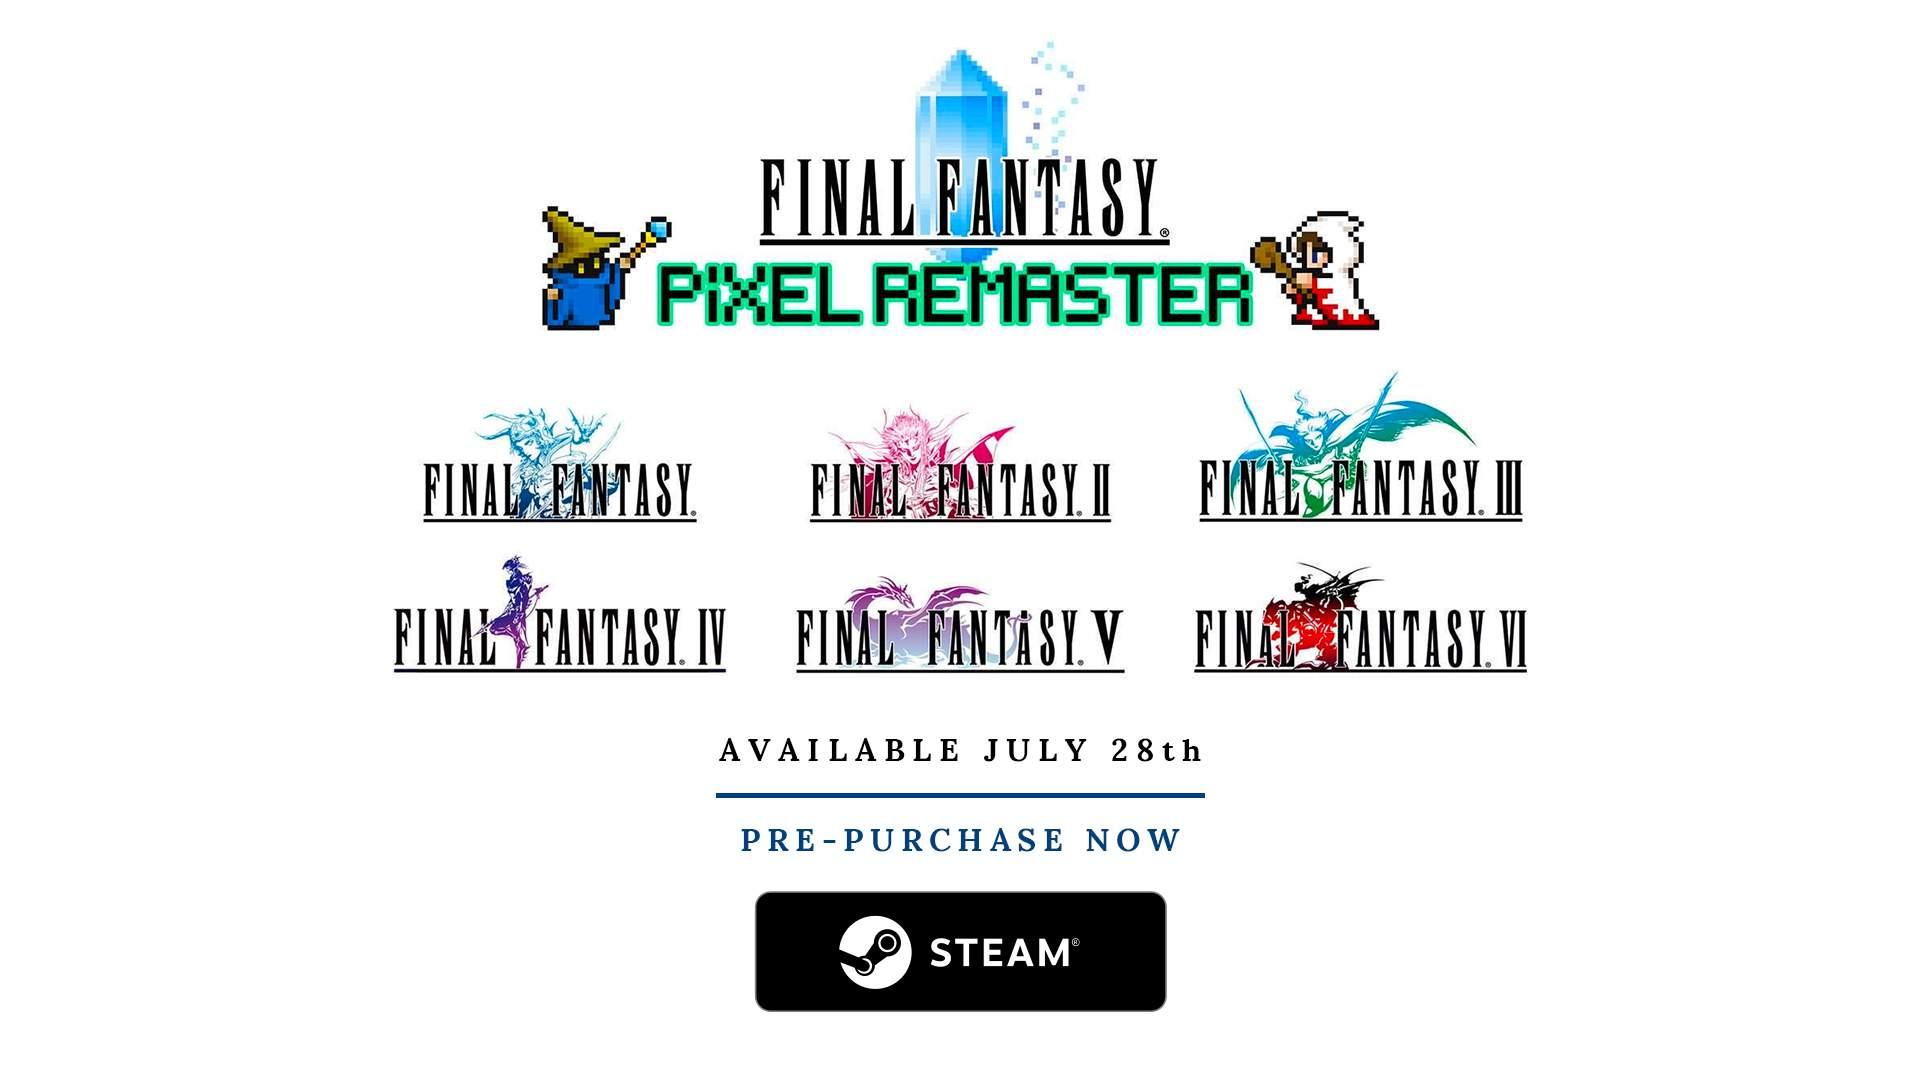 The FINAL FANTASY pixel remaster logo sits top center above FINAL FANTASY 1-6 logos